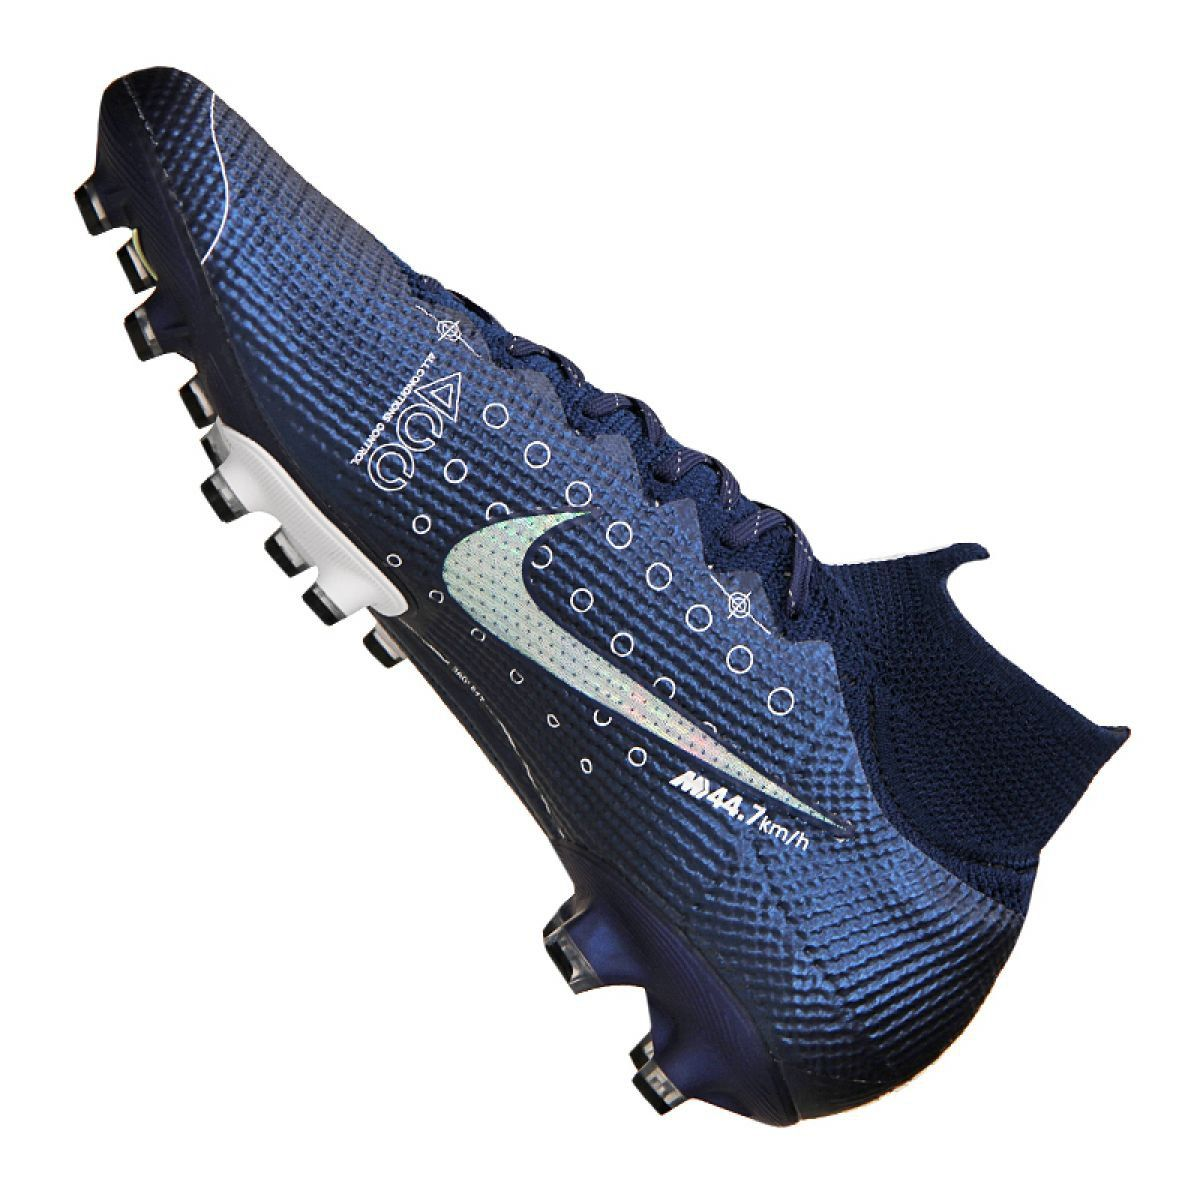 Buty Pilkarskie Nike Superfly 7 Elite Mds Ag Pro M Ck0012 401 Granatowe Granatowe Football Shoes Superfly Sprint Shoes